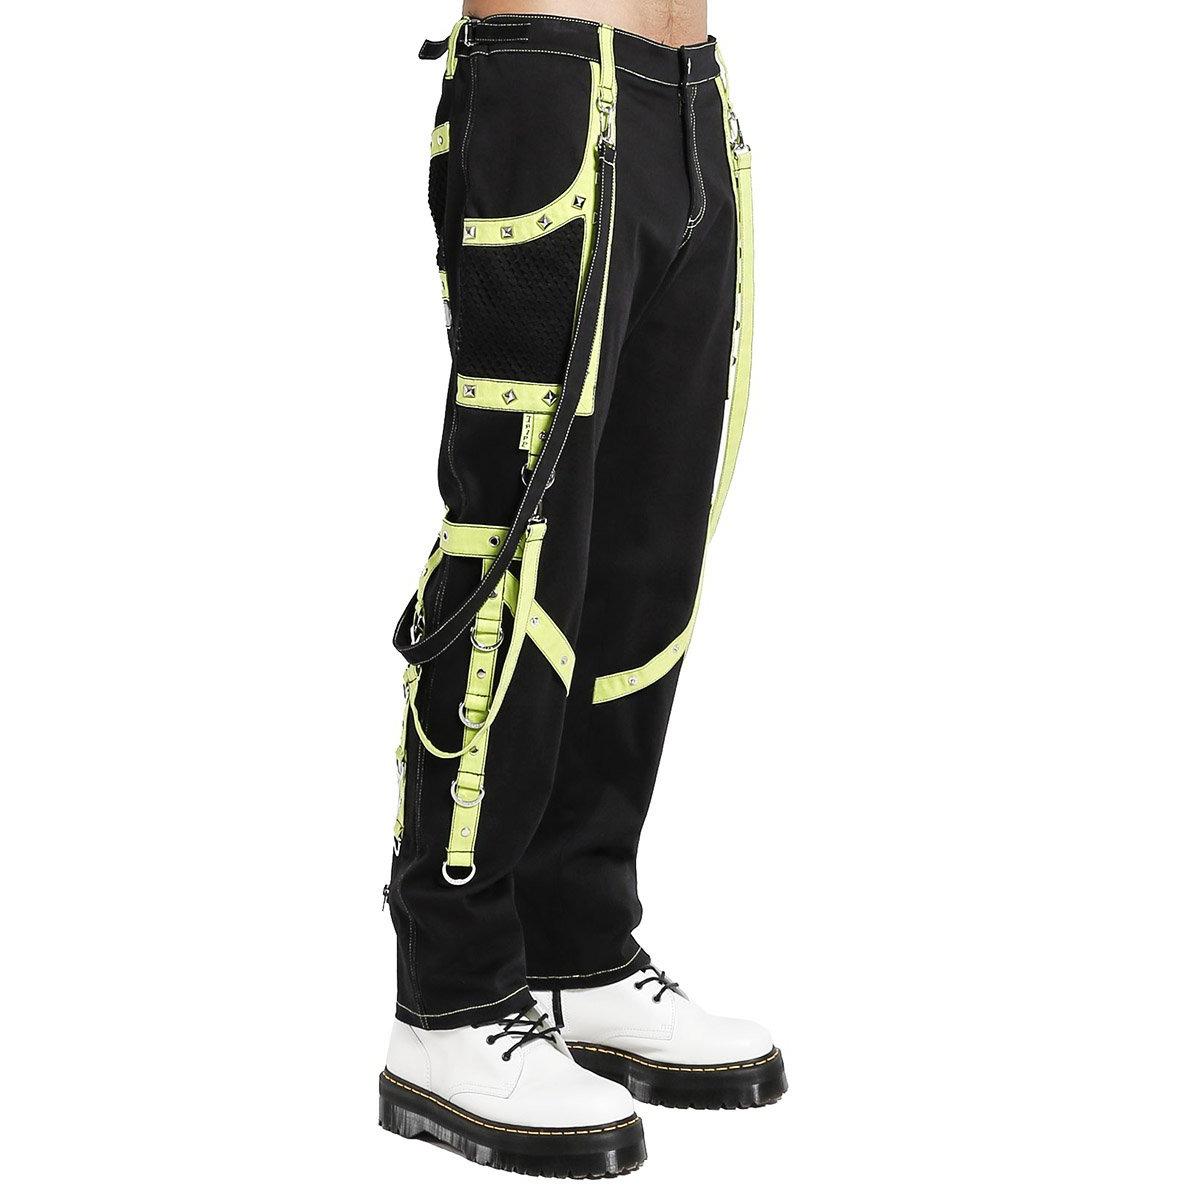 Men's Gothic Bondage Pant Rock Hard Trouser Heavy Weight Pant EMO/TRIPP PANTS